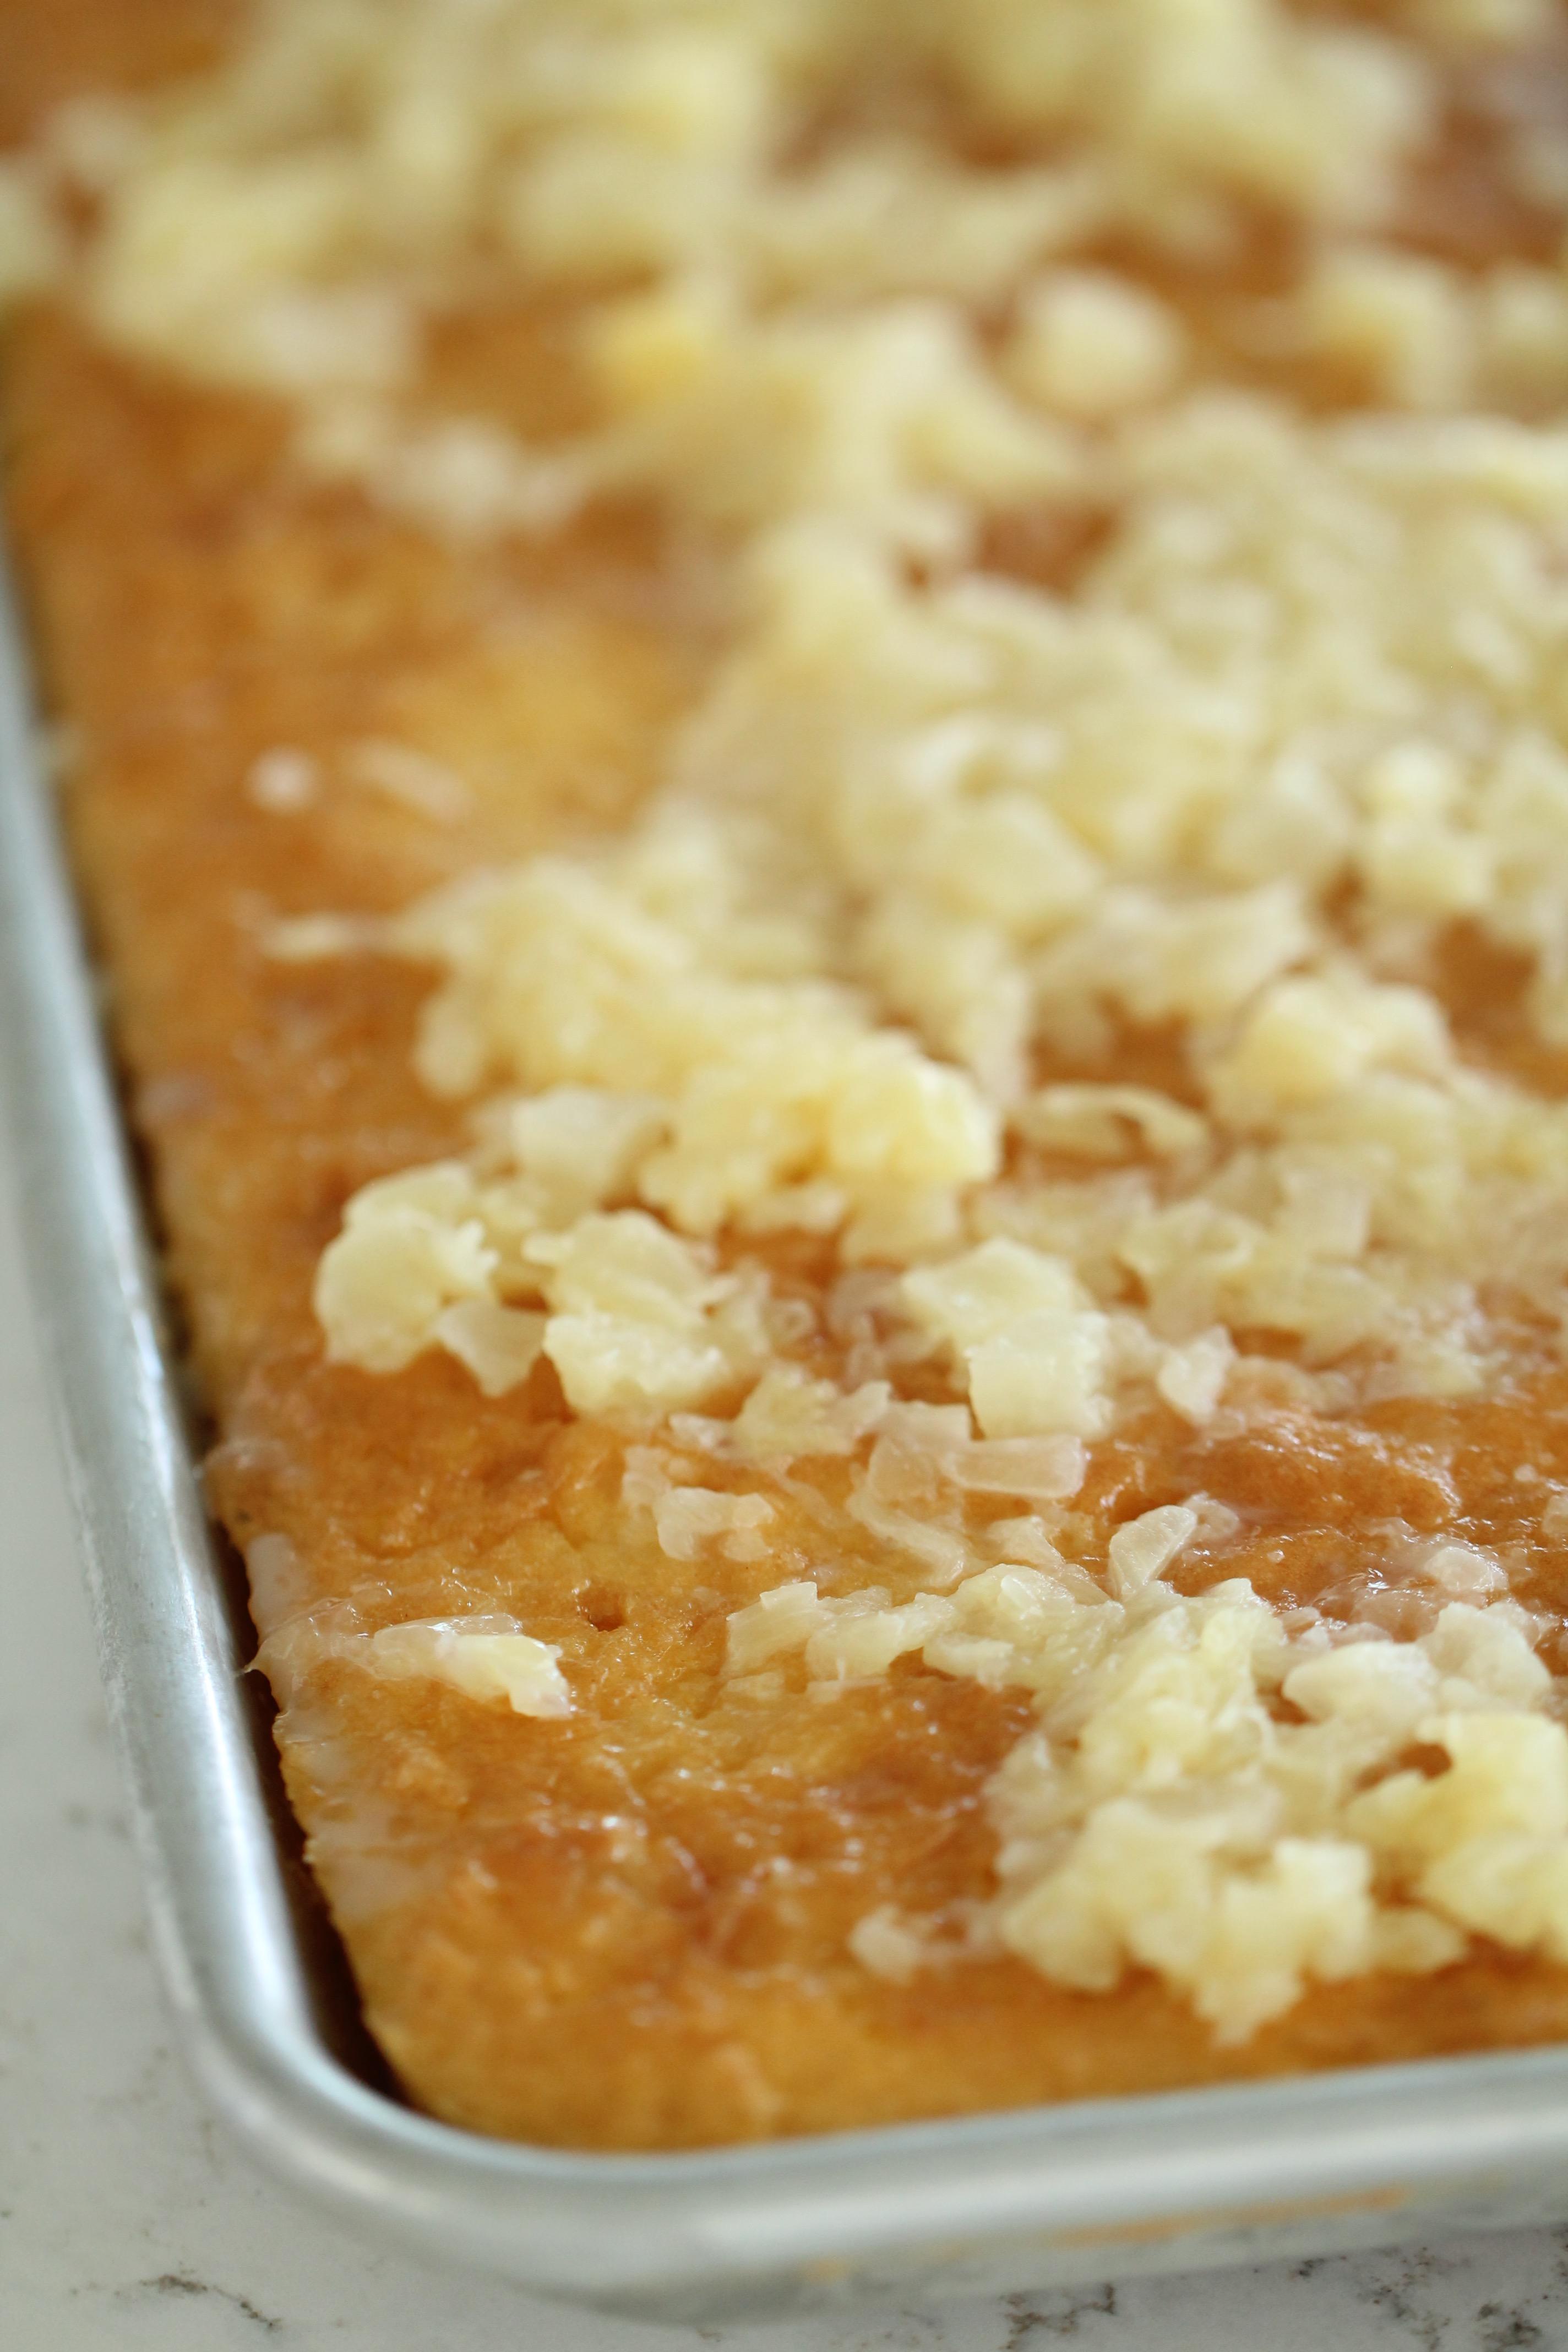 Cream of coconut poured onto yellow cake